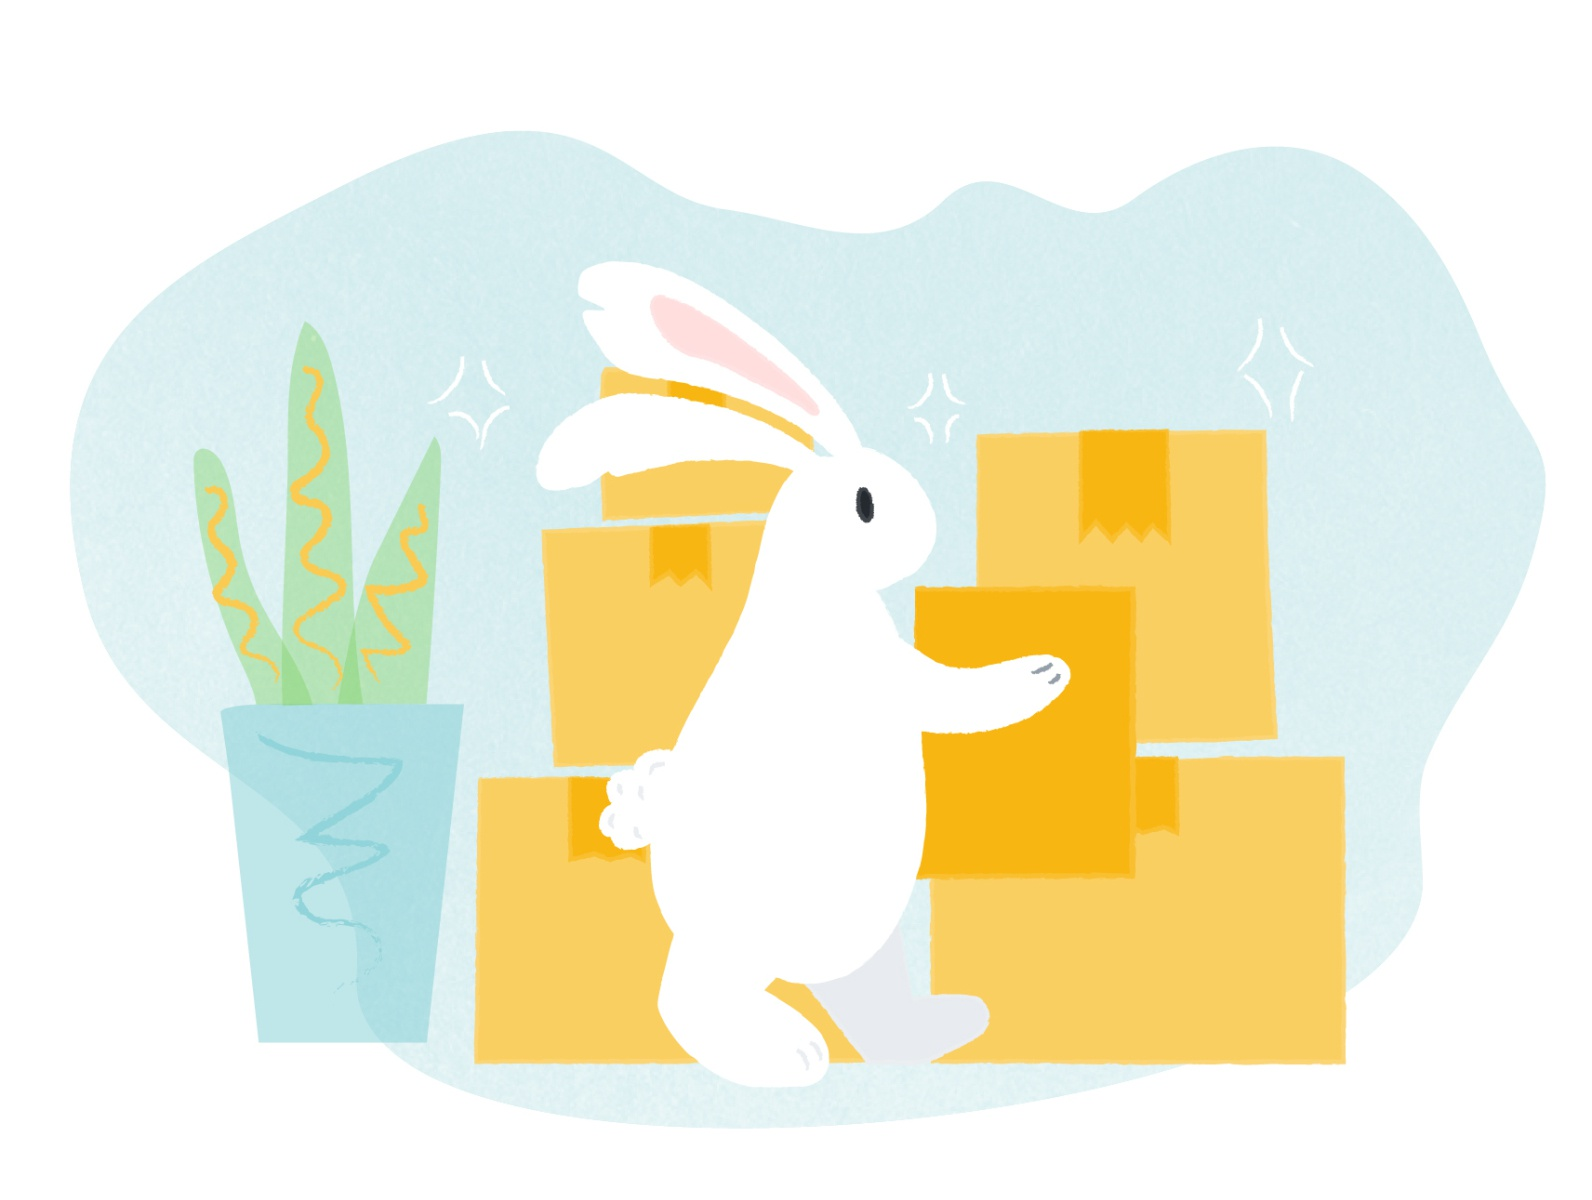 Dribbble bunny